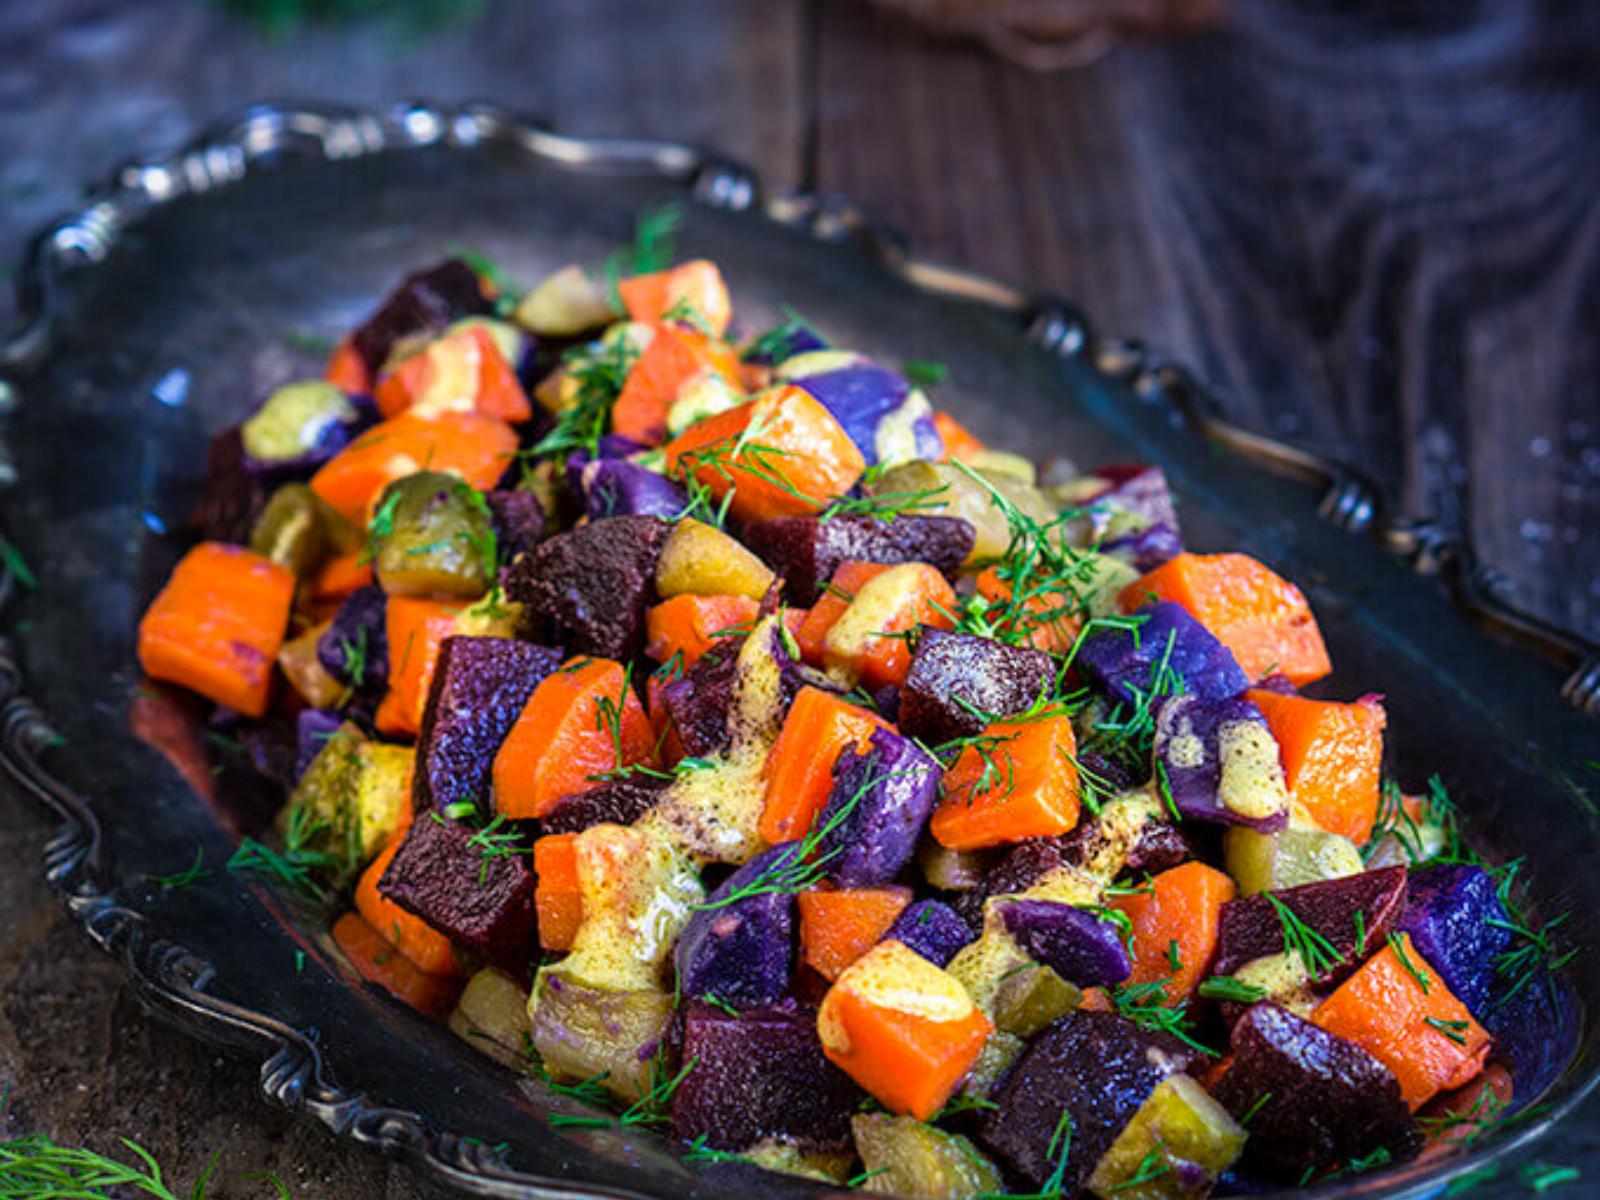 Carrot Beet Salad With Mustard Garlic Vinaigrette and Dill